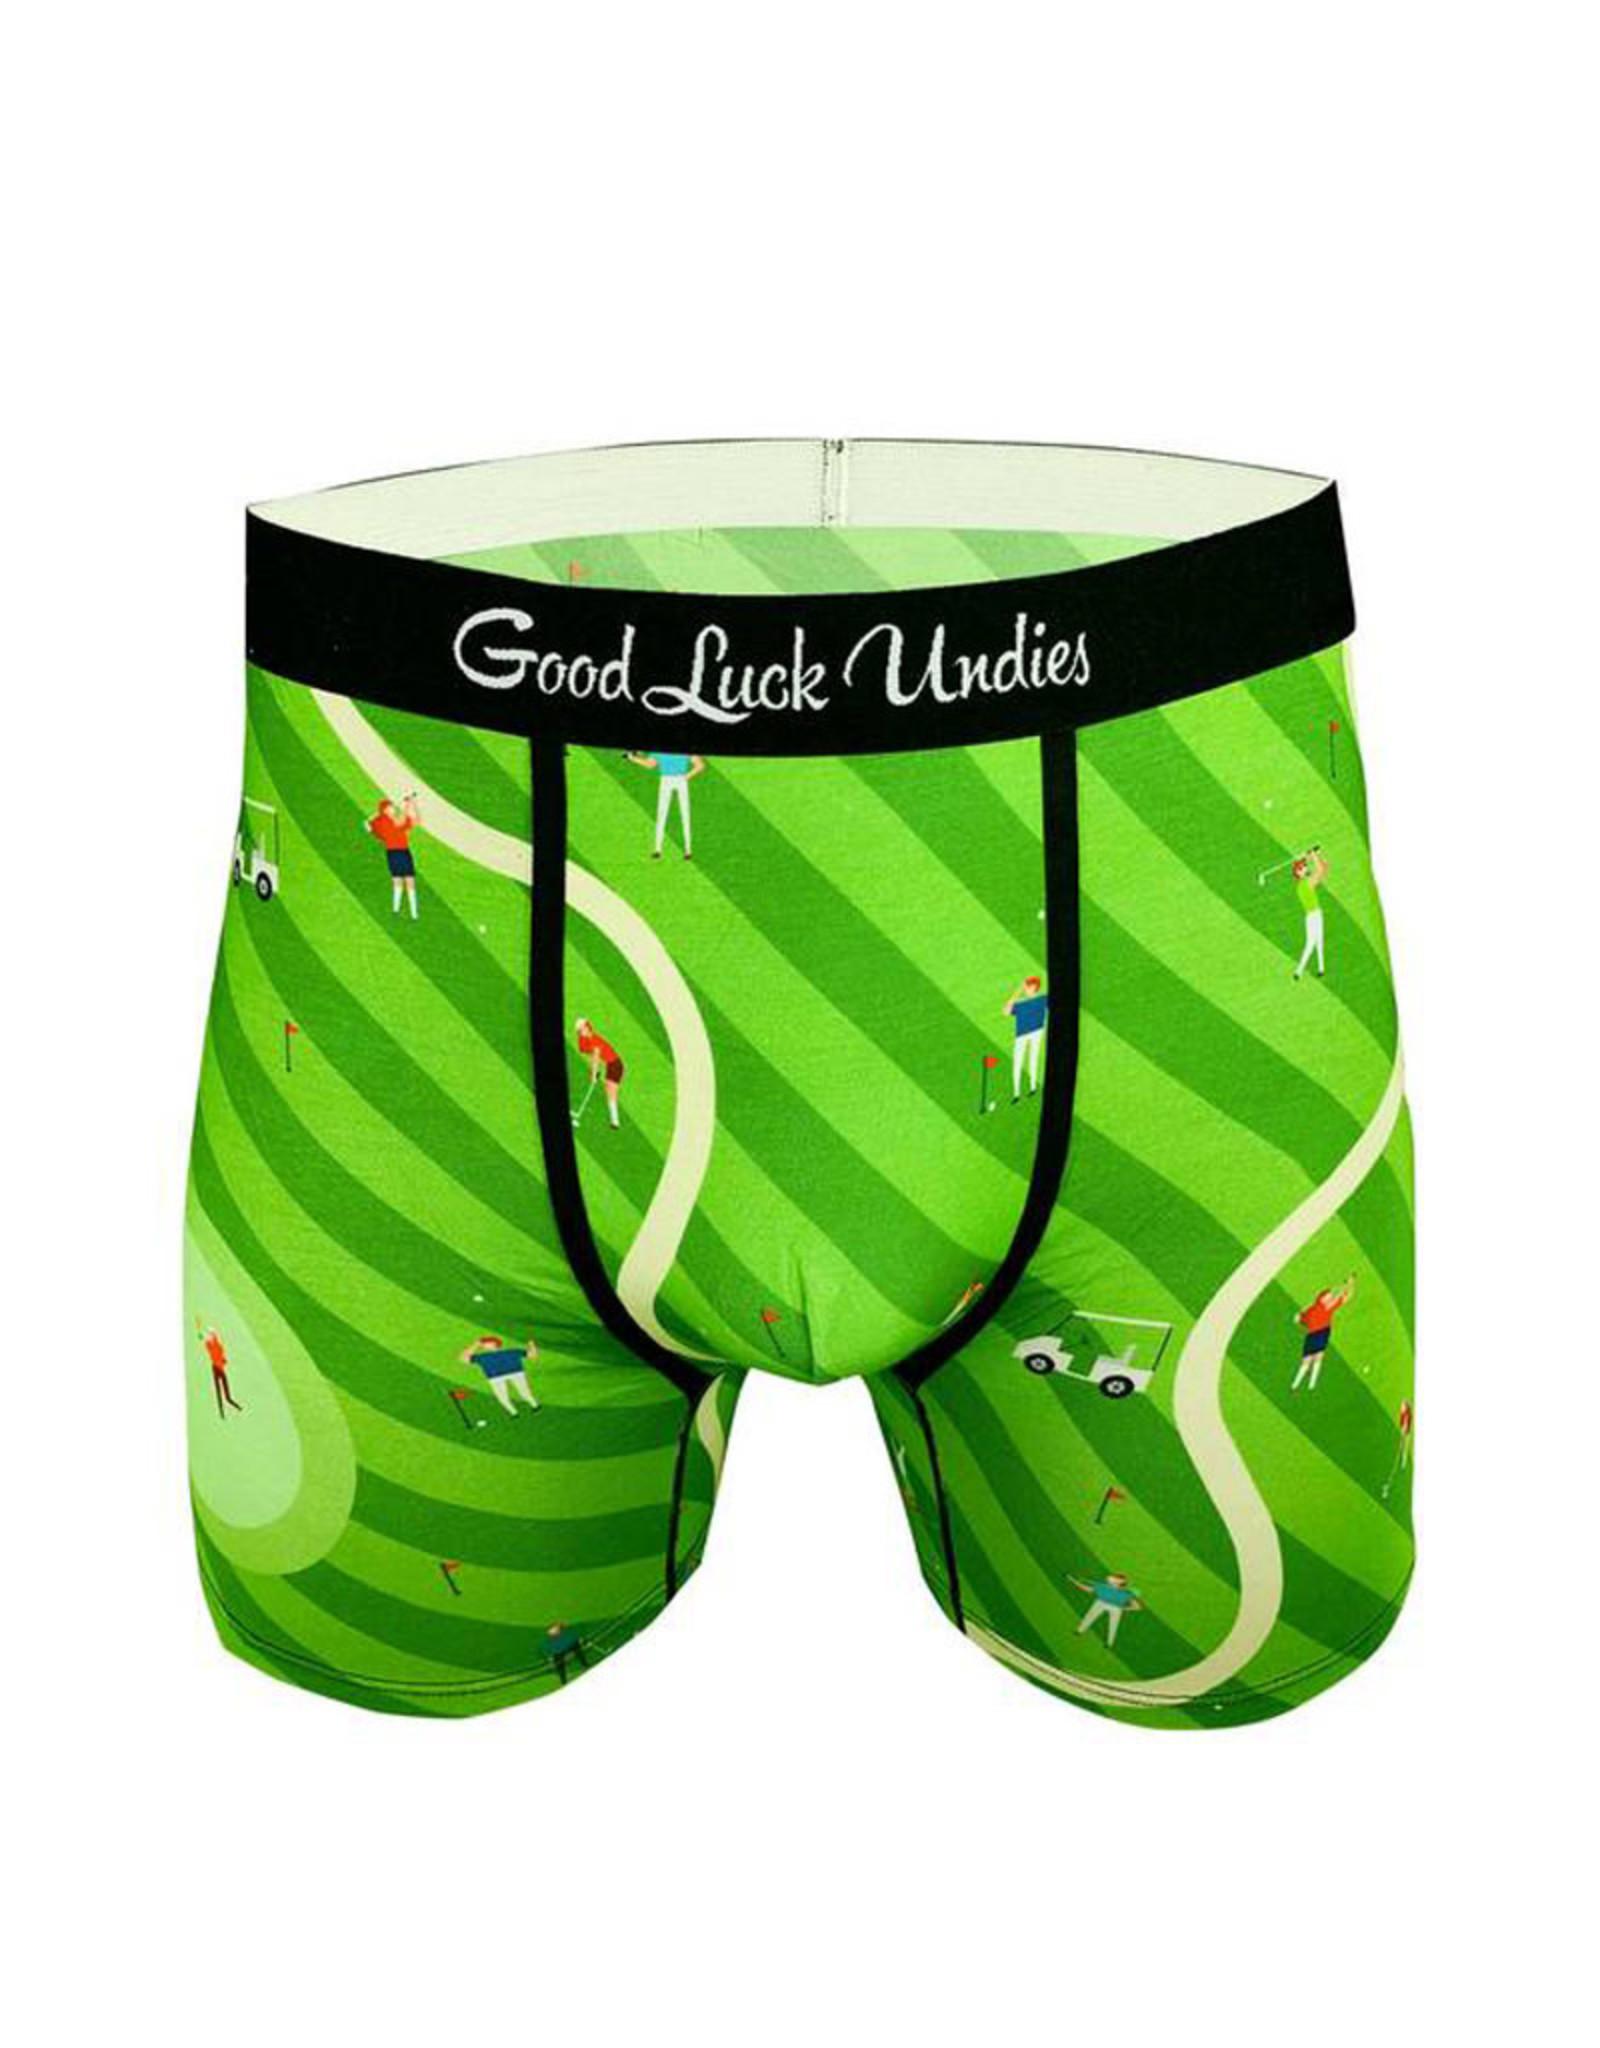 Boxeur ( Good Luck Undies ) Golf